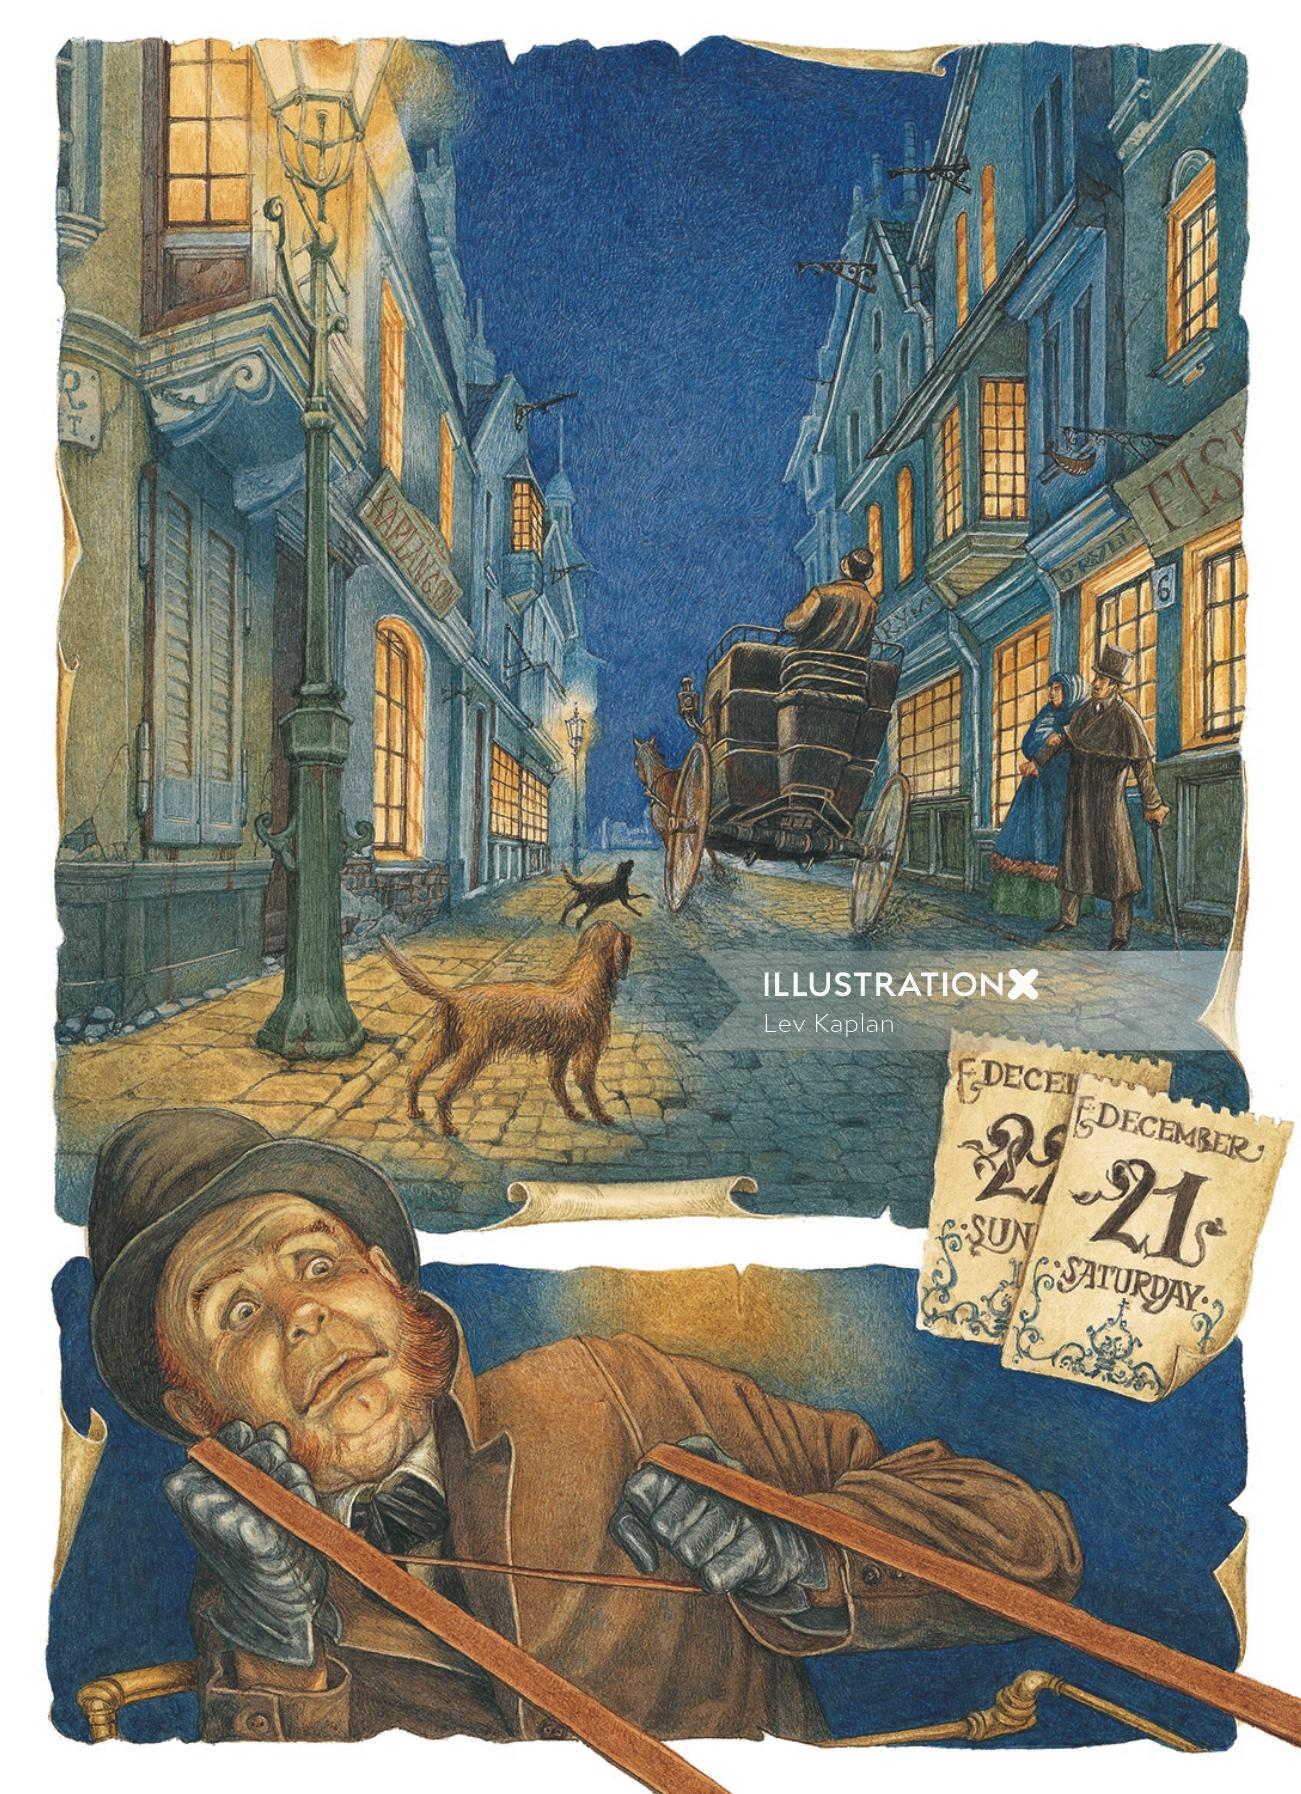 Jules Verne, 80 Days, Adventure, Literature